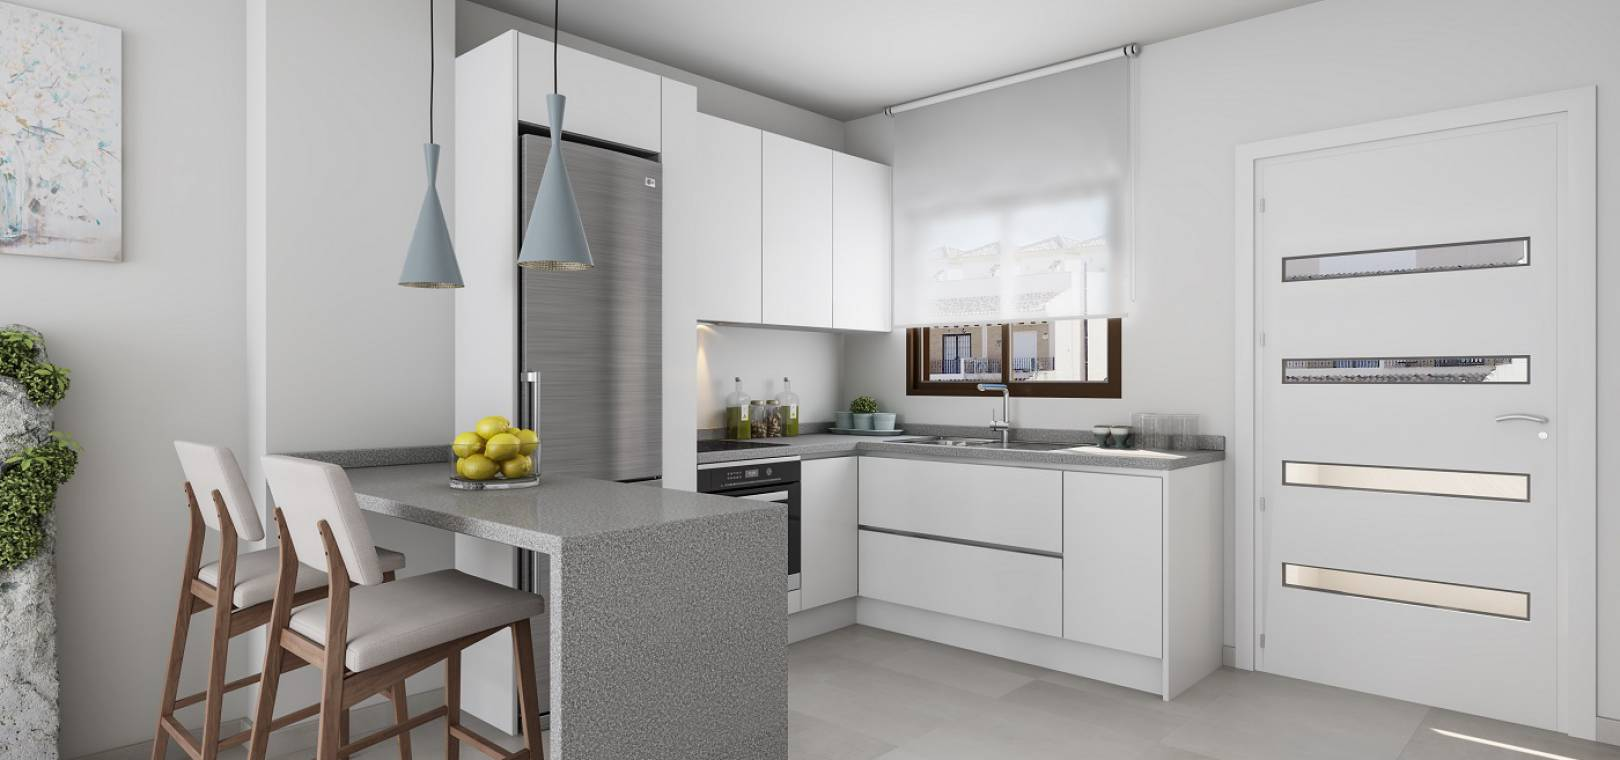 San_Pedro_del_Pinatar_Buy_New_Modern_Penthouse_Apartments_nsp202-7